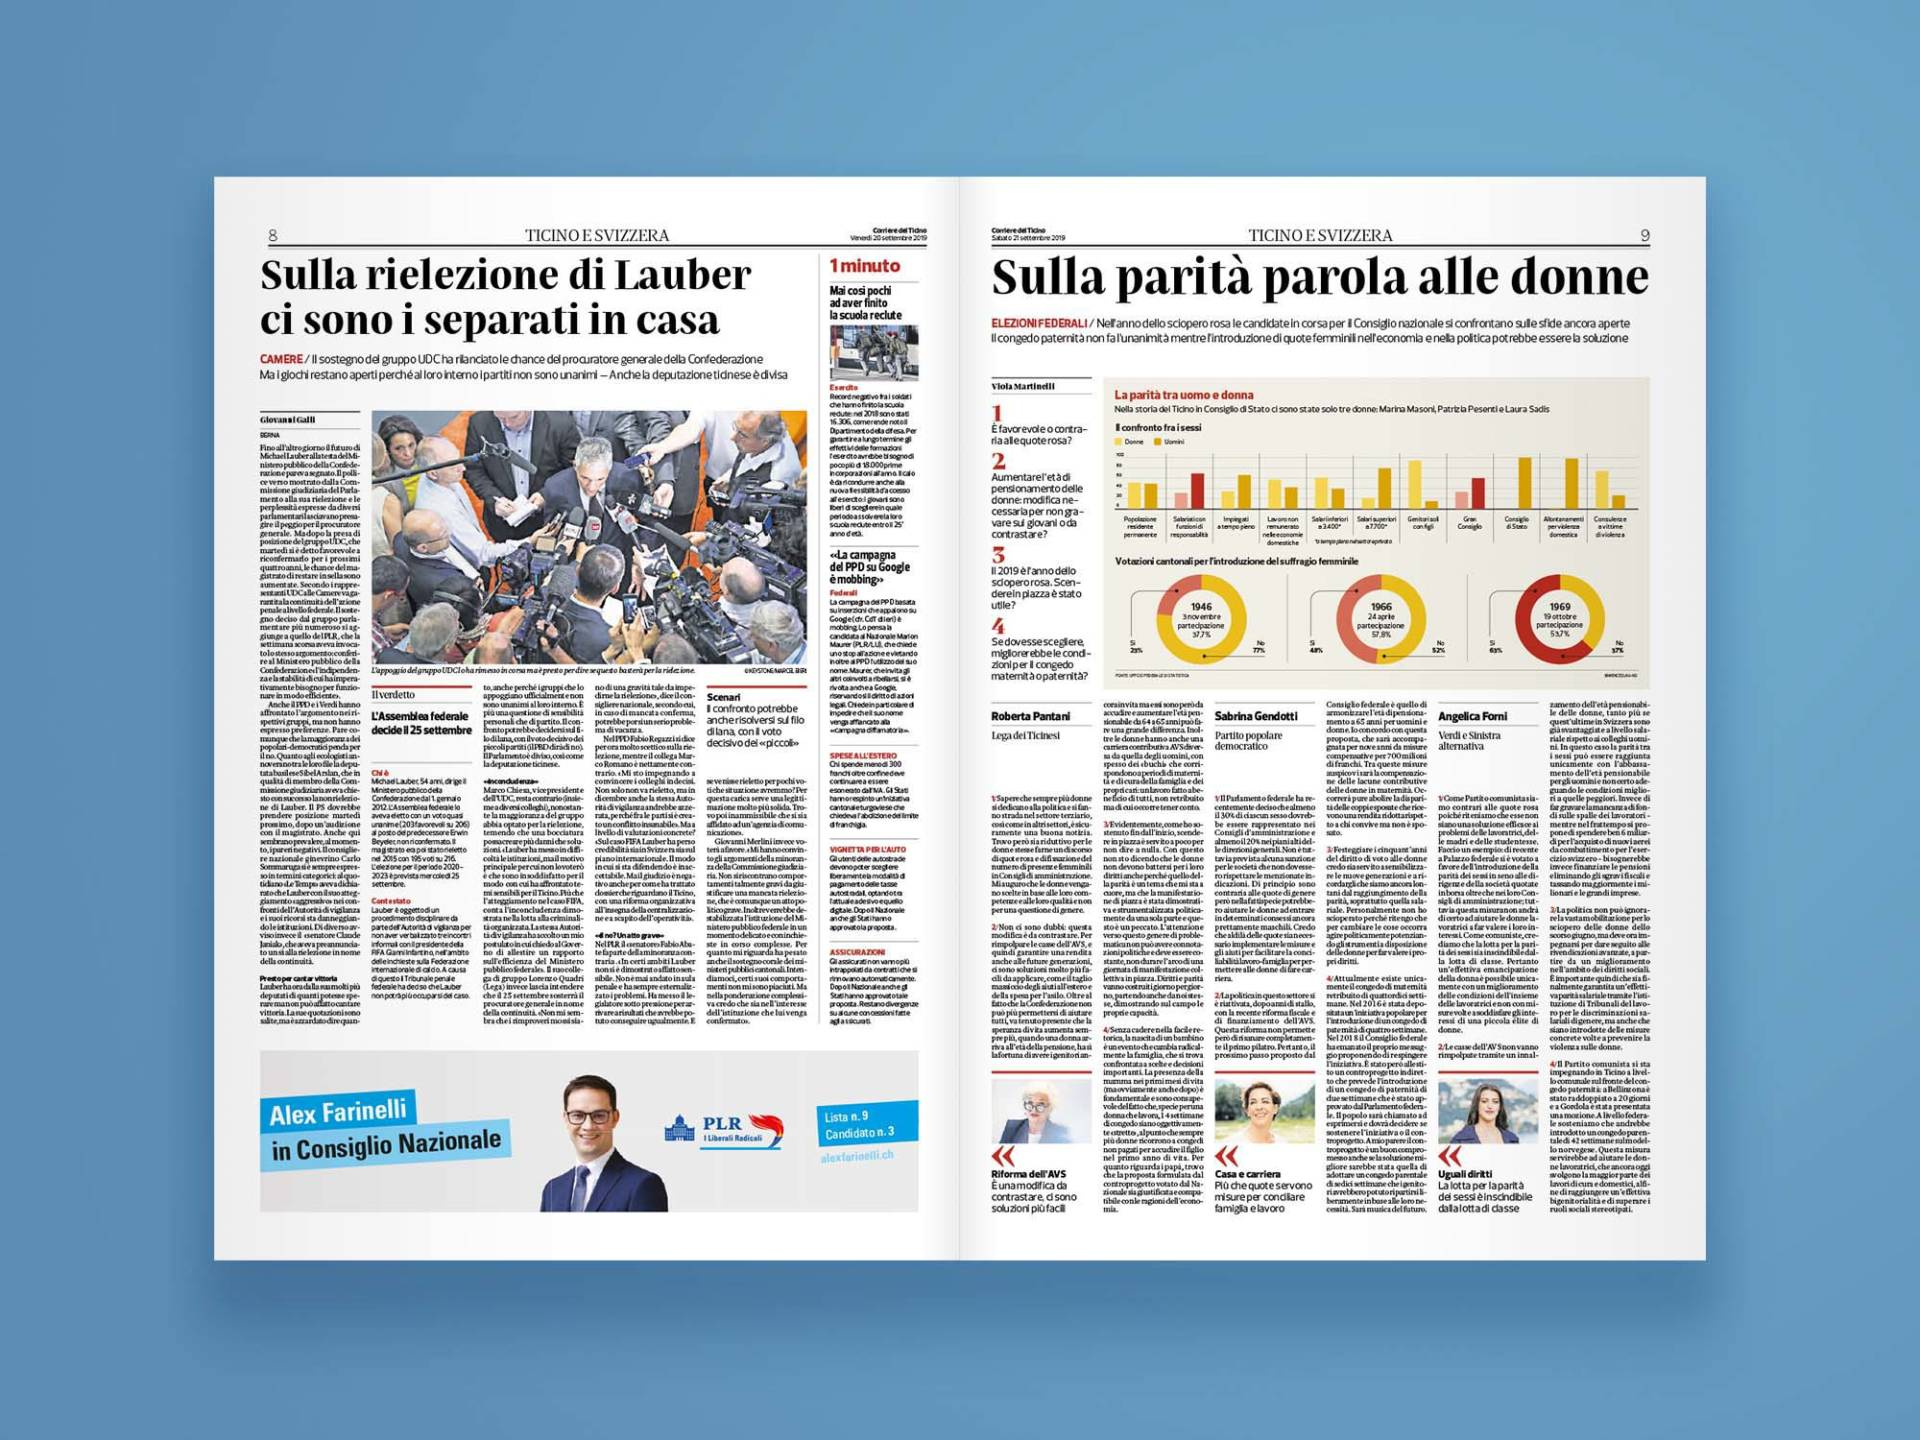 Corriere_Del_Ticino_05_Wenceslau_News_Design